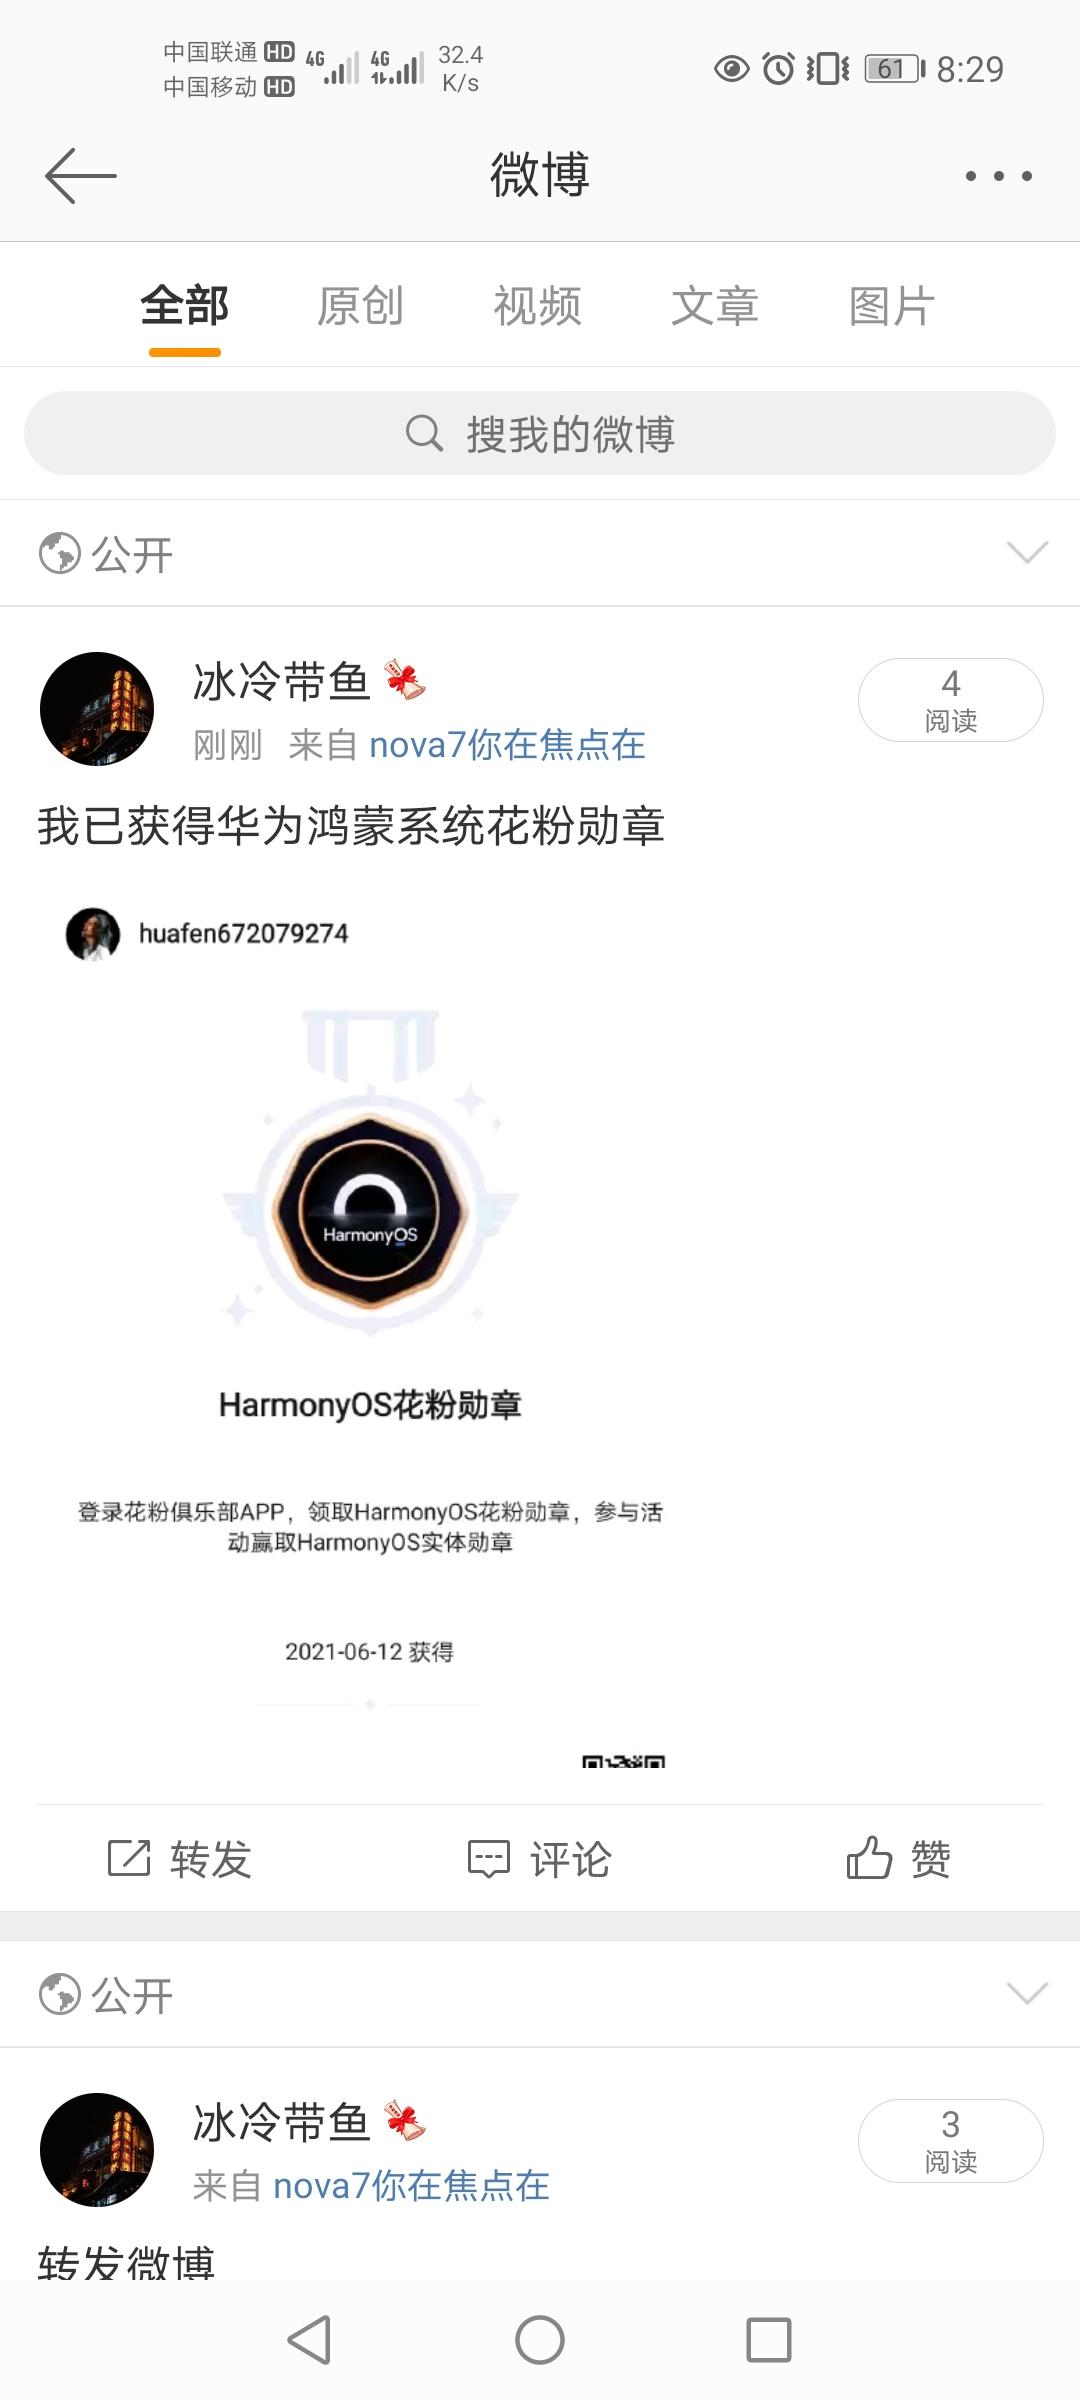 Screenshot_20210612_082907_com.sina.weibo.jpg